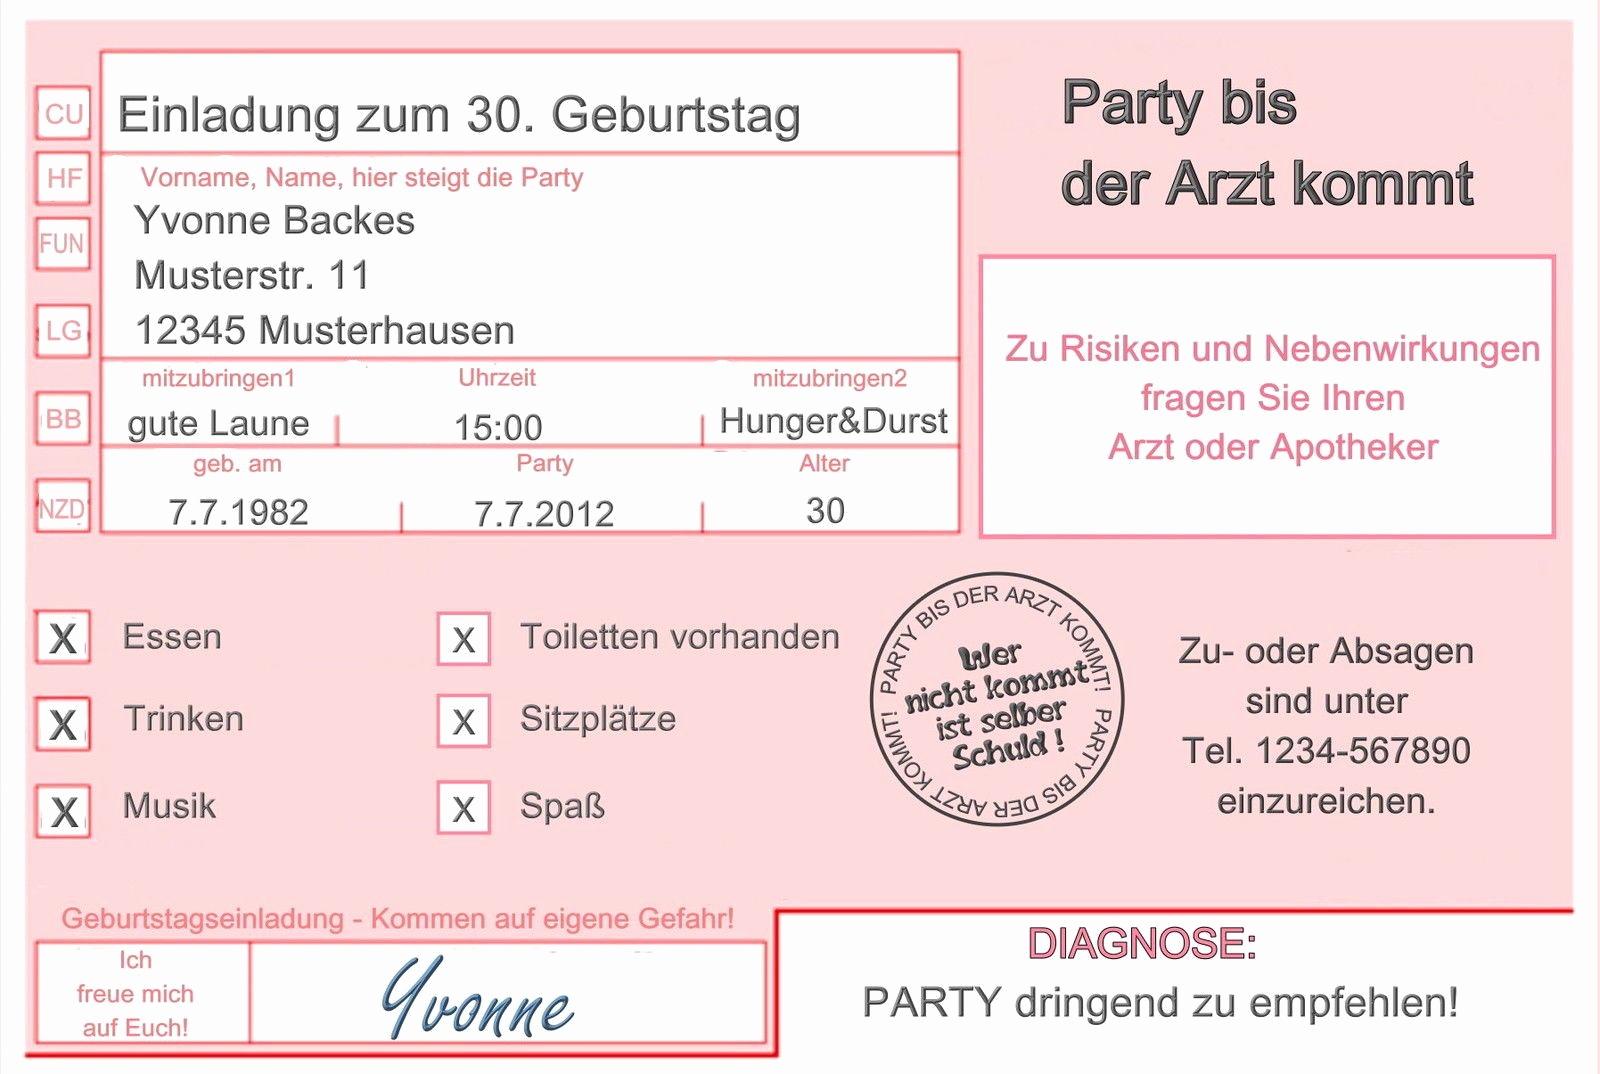 einladung 1 geburtstag elegant geburtstag einladung lustig einladung 60er 0d meinung of einladung 1 geburtstag